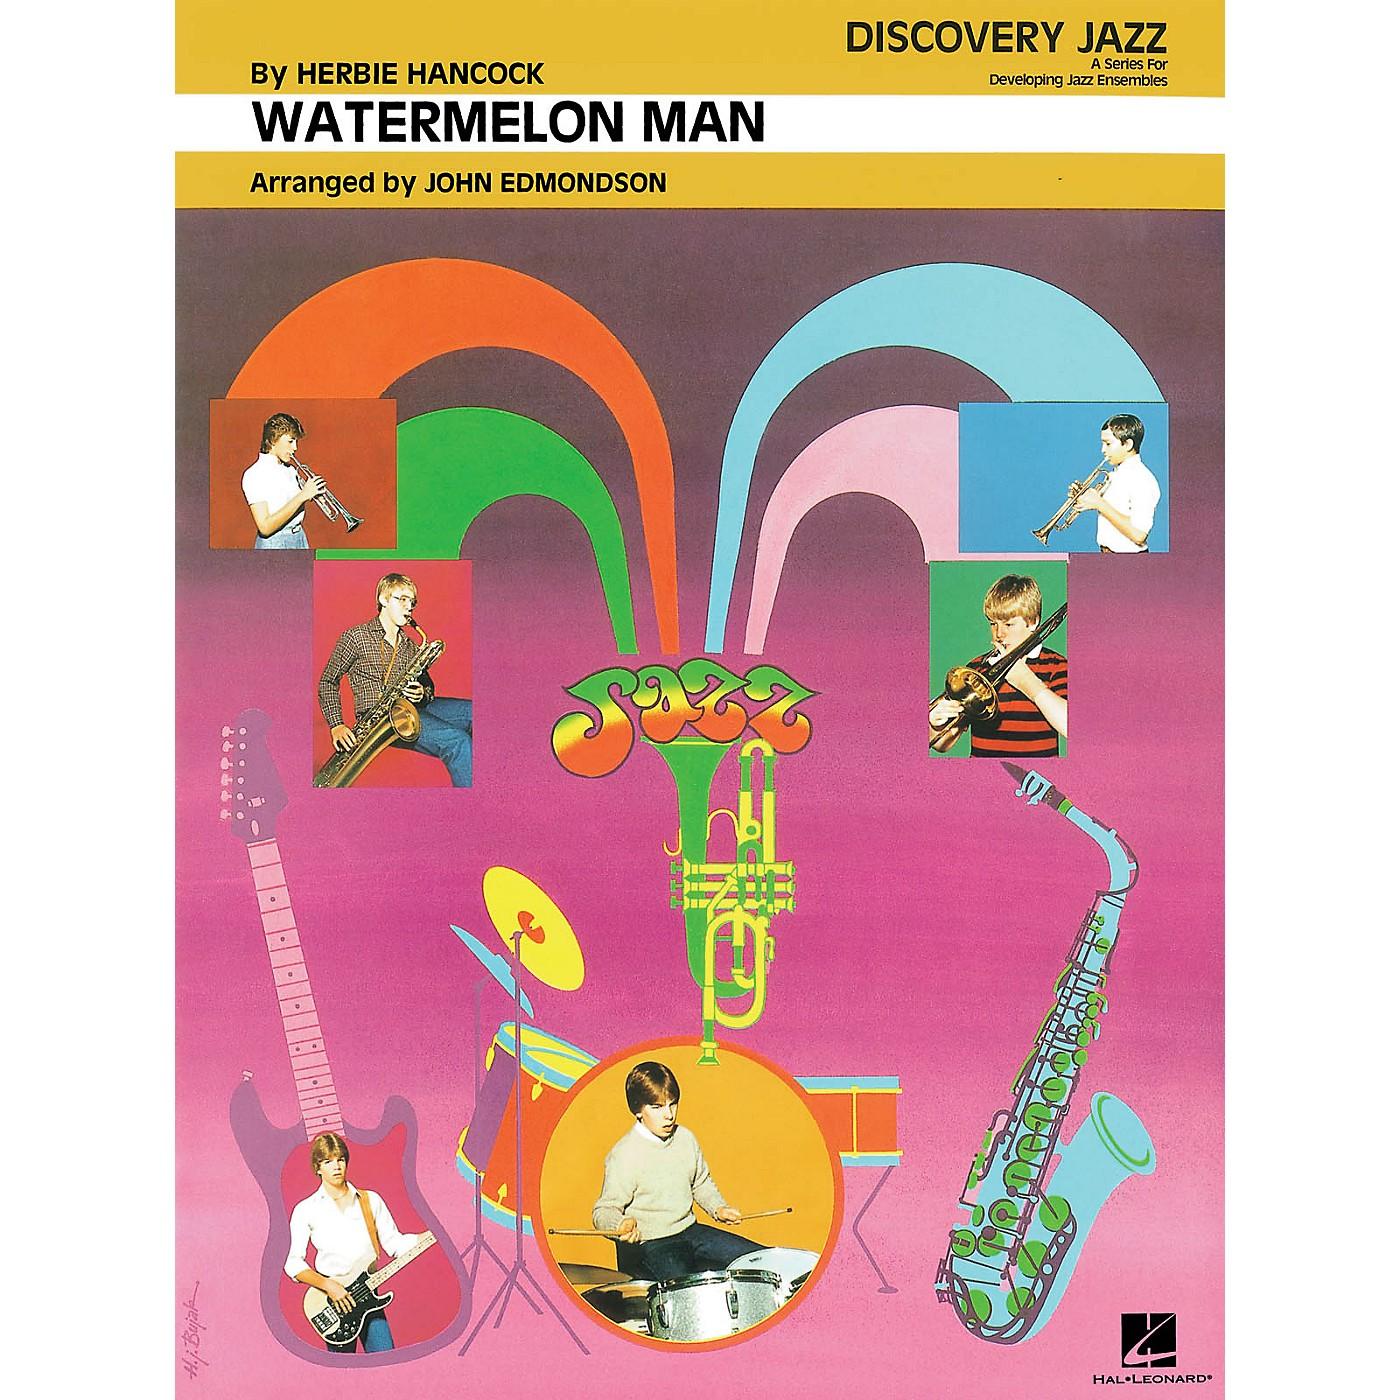 Hal Leonard Watermelon Man Jazz Band Level 1-2 by Herbie Hancock Arranged by John Edmondson thumbnail